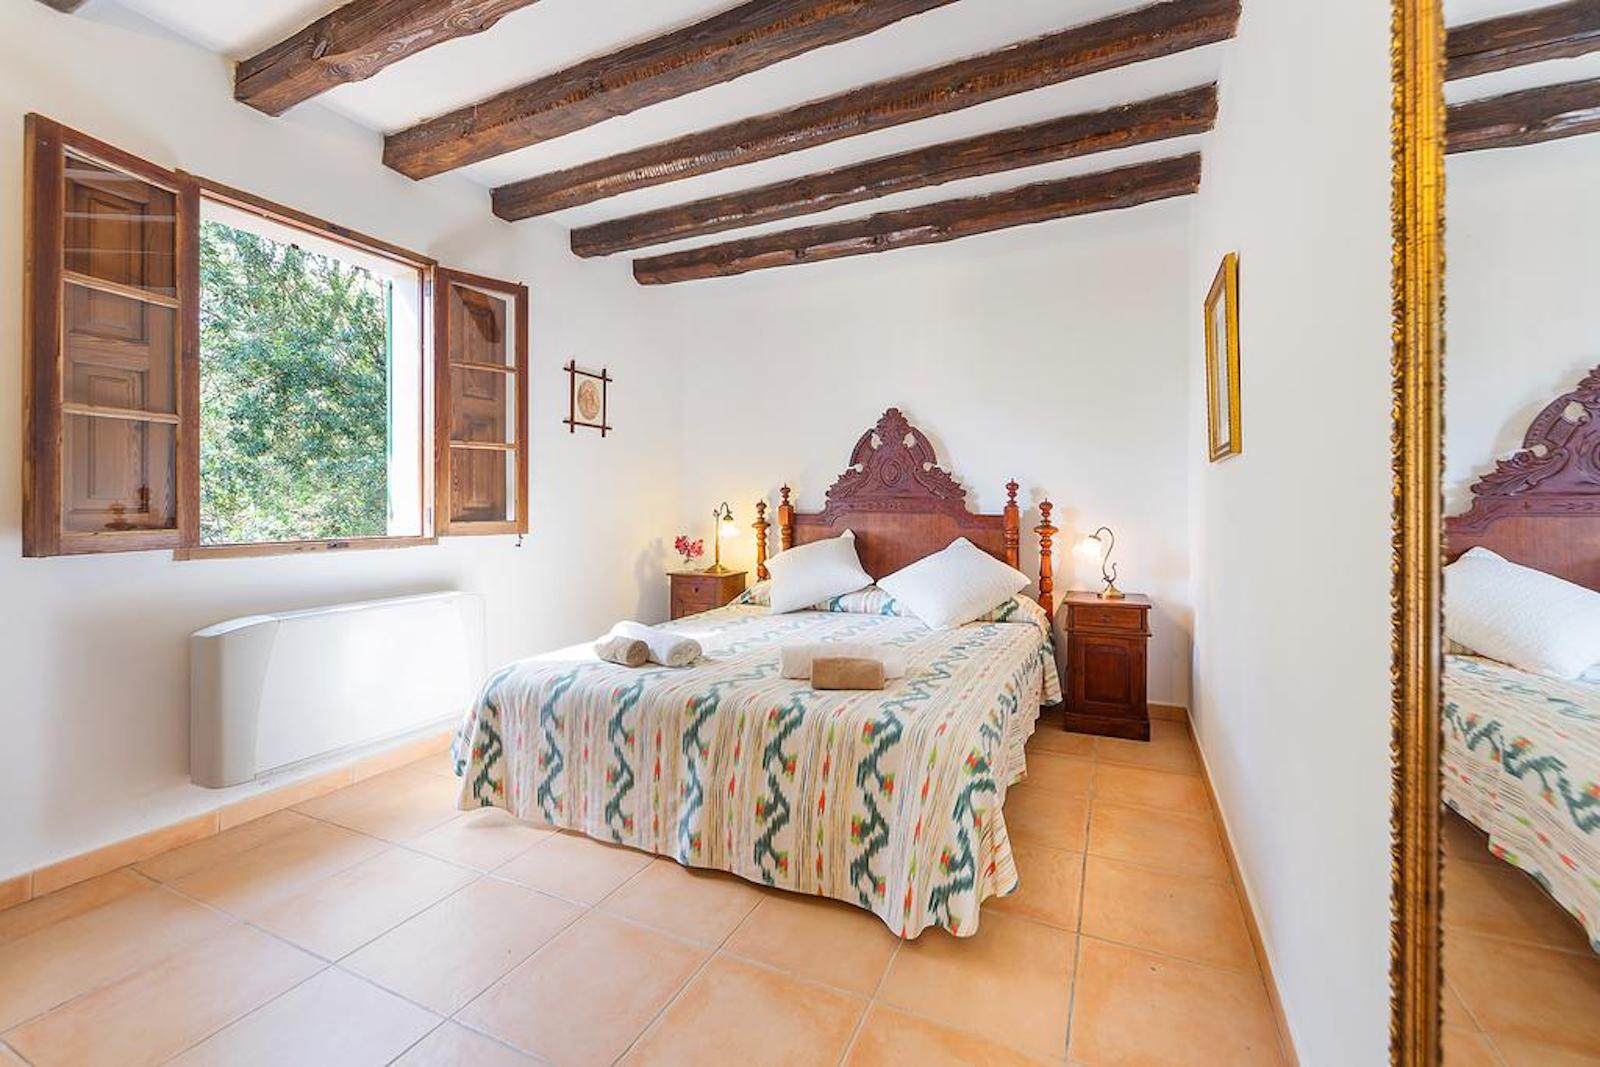 ISLA-Travel-Finca-Hotel-Mallorca-DZ